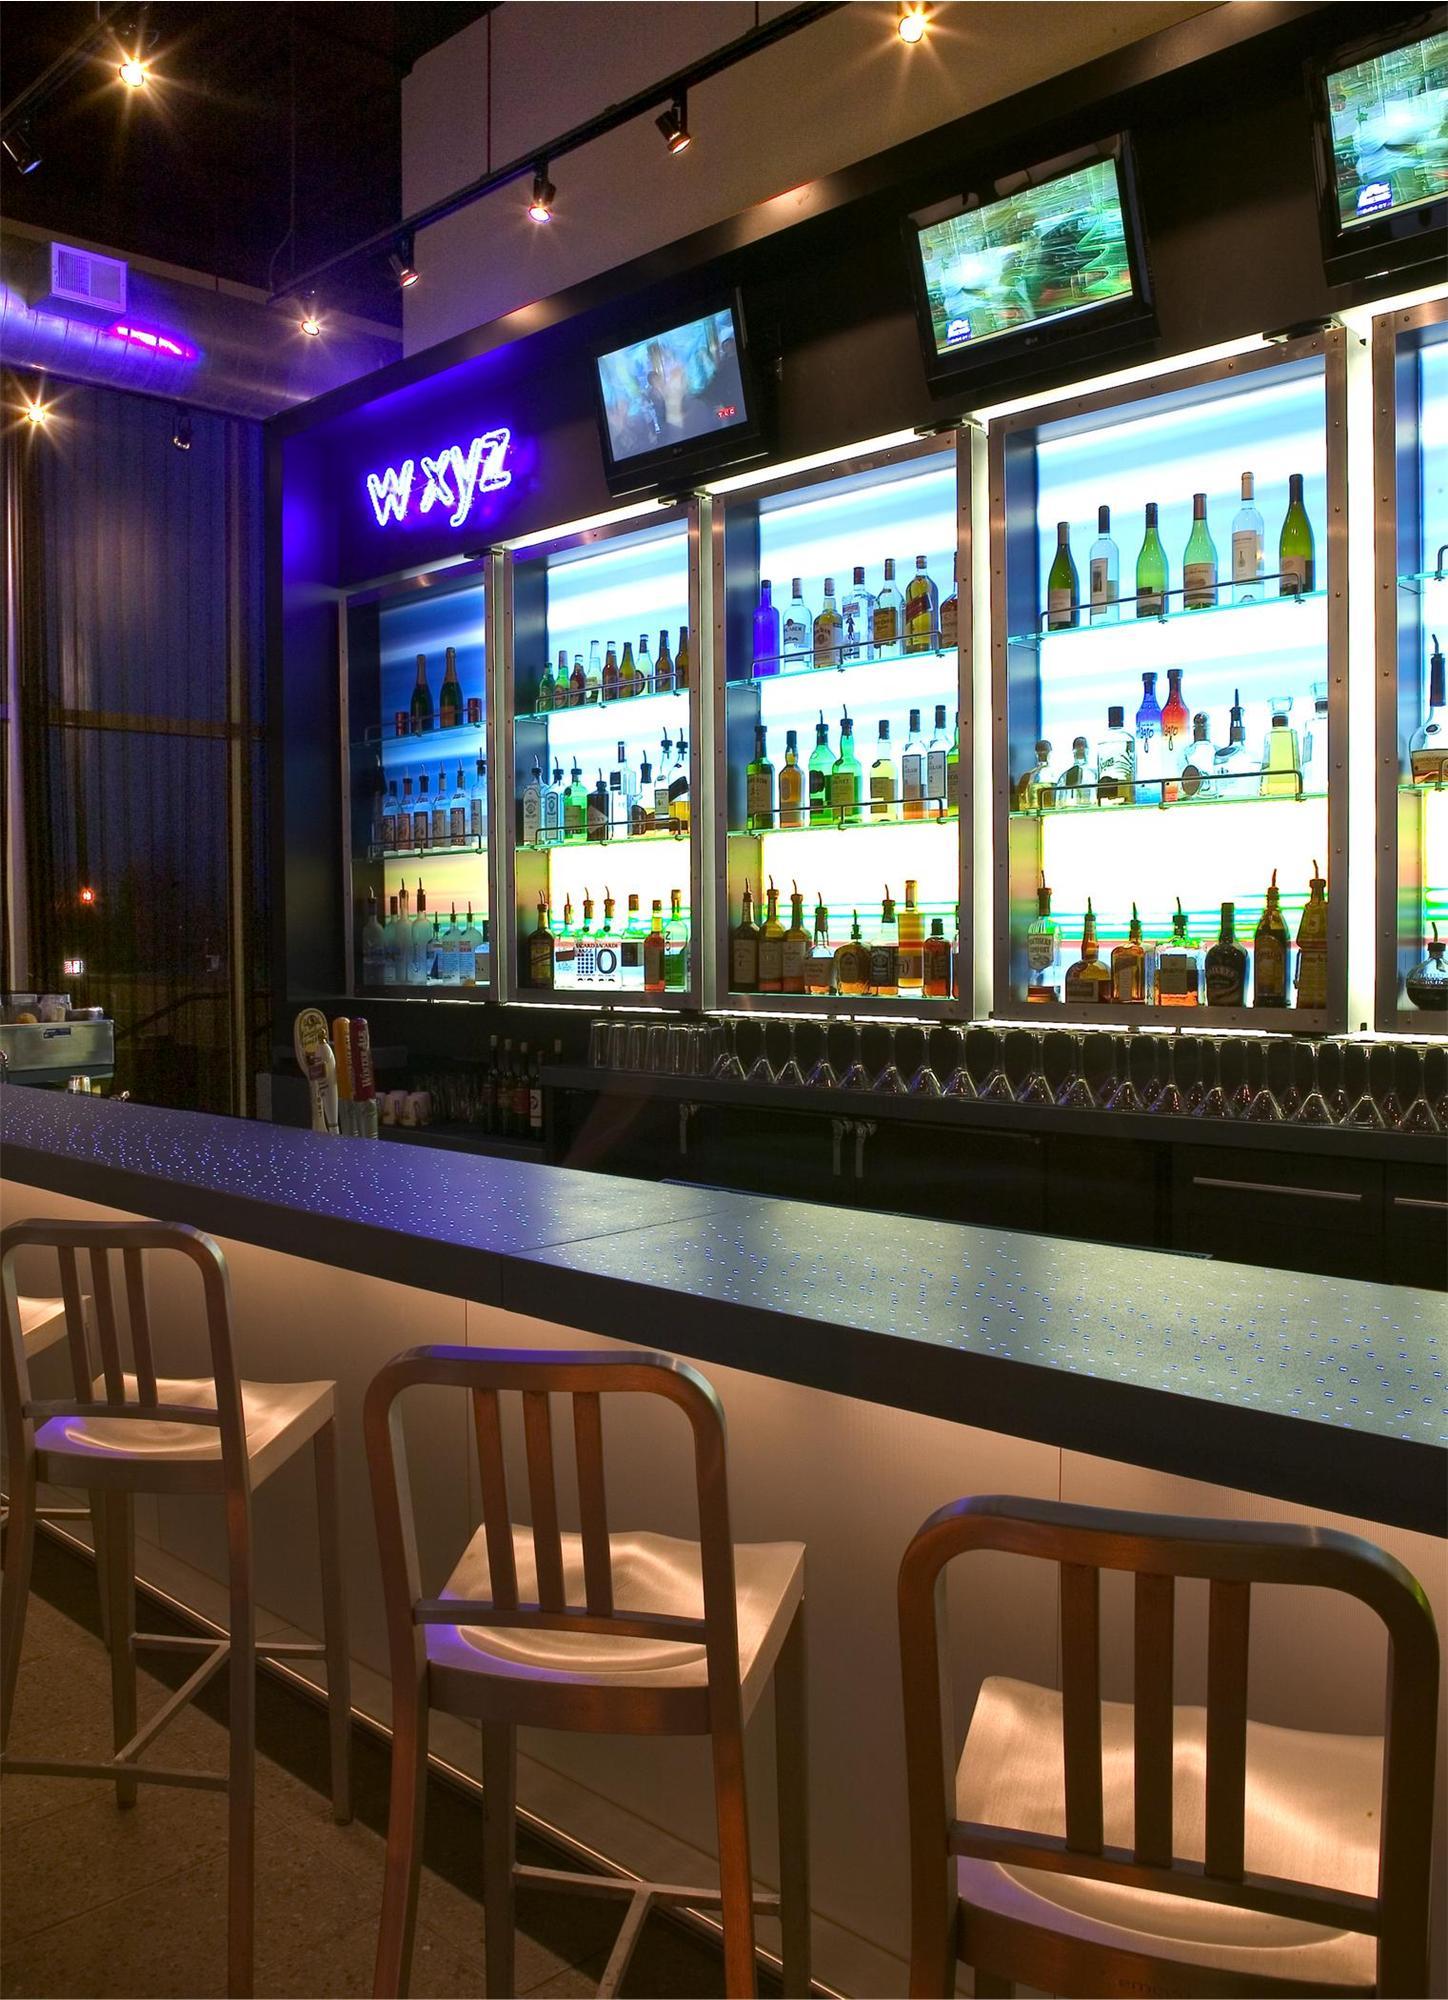 Bar area in the Aloft Hotel in Minneapolis, MN